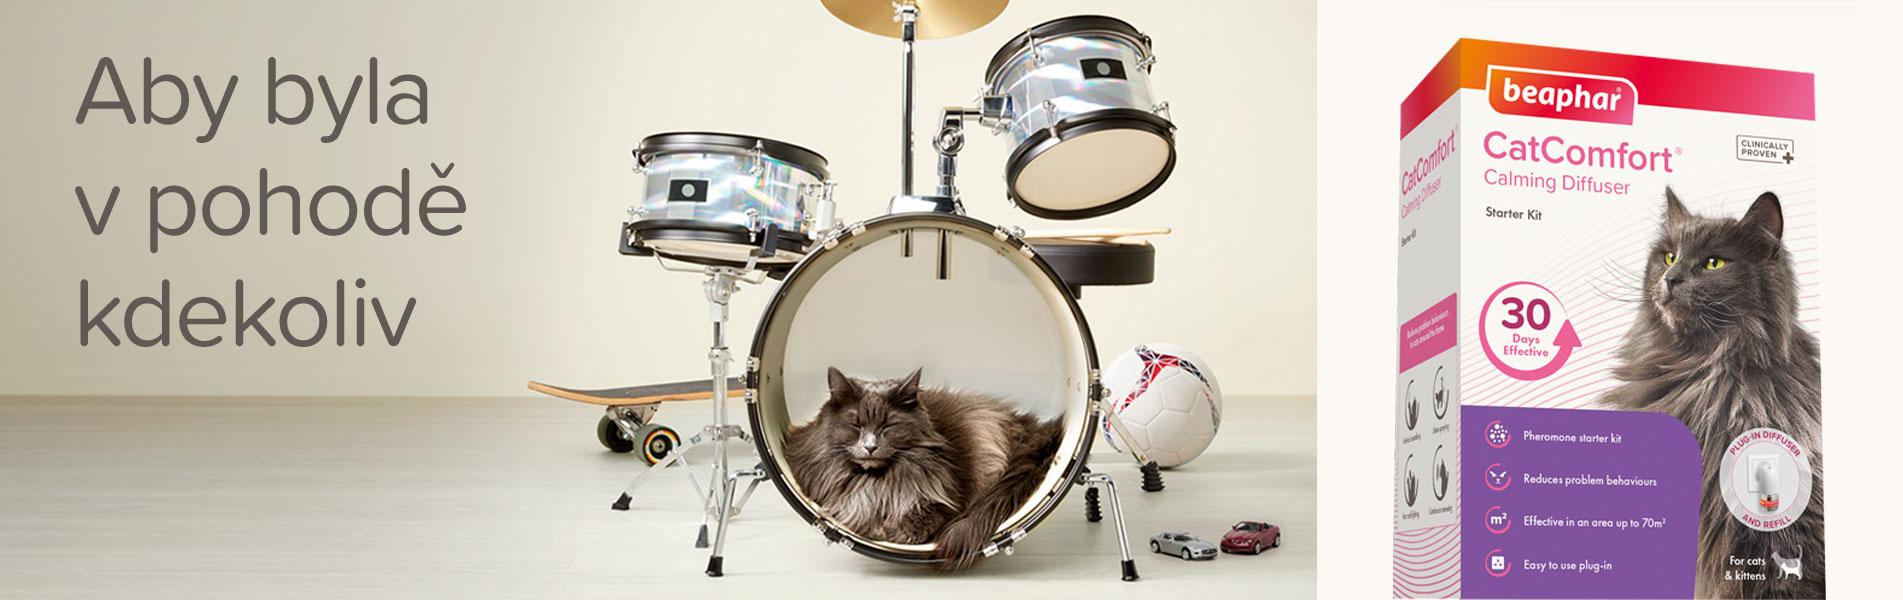 CatComfort